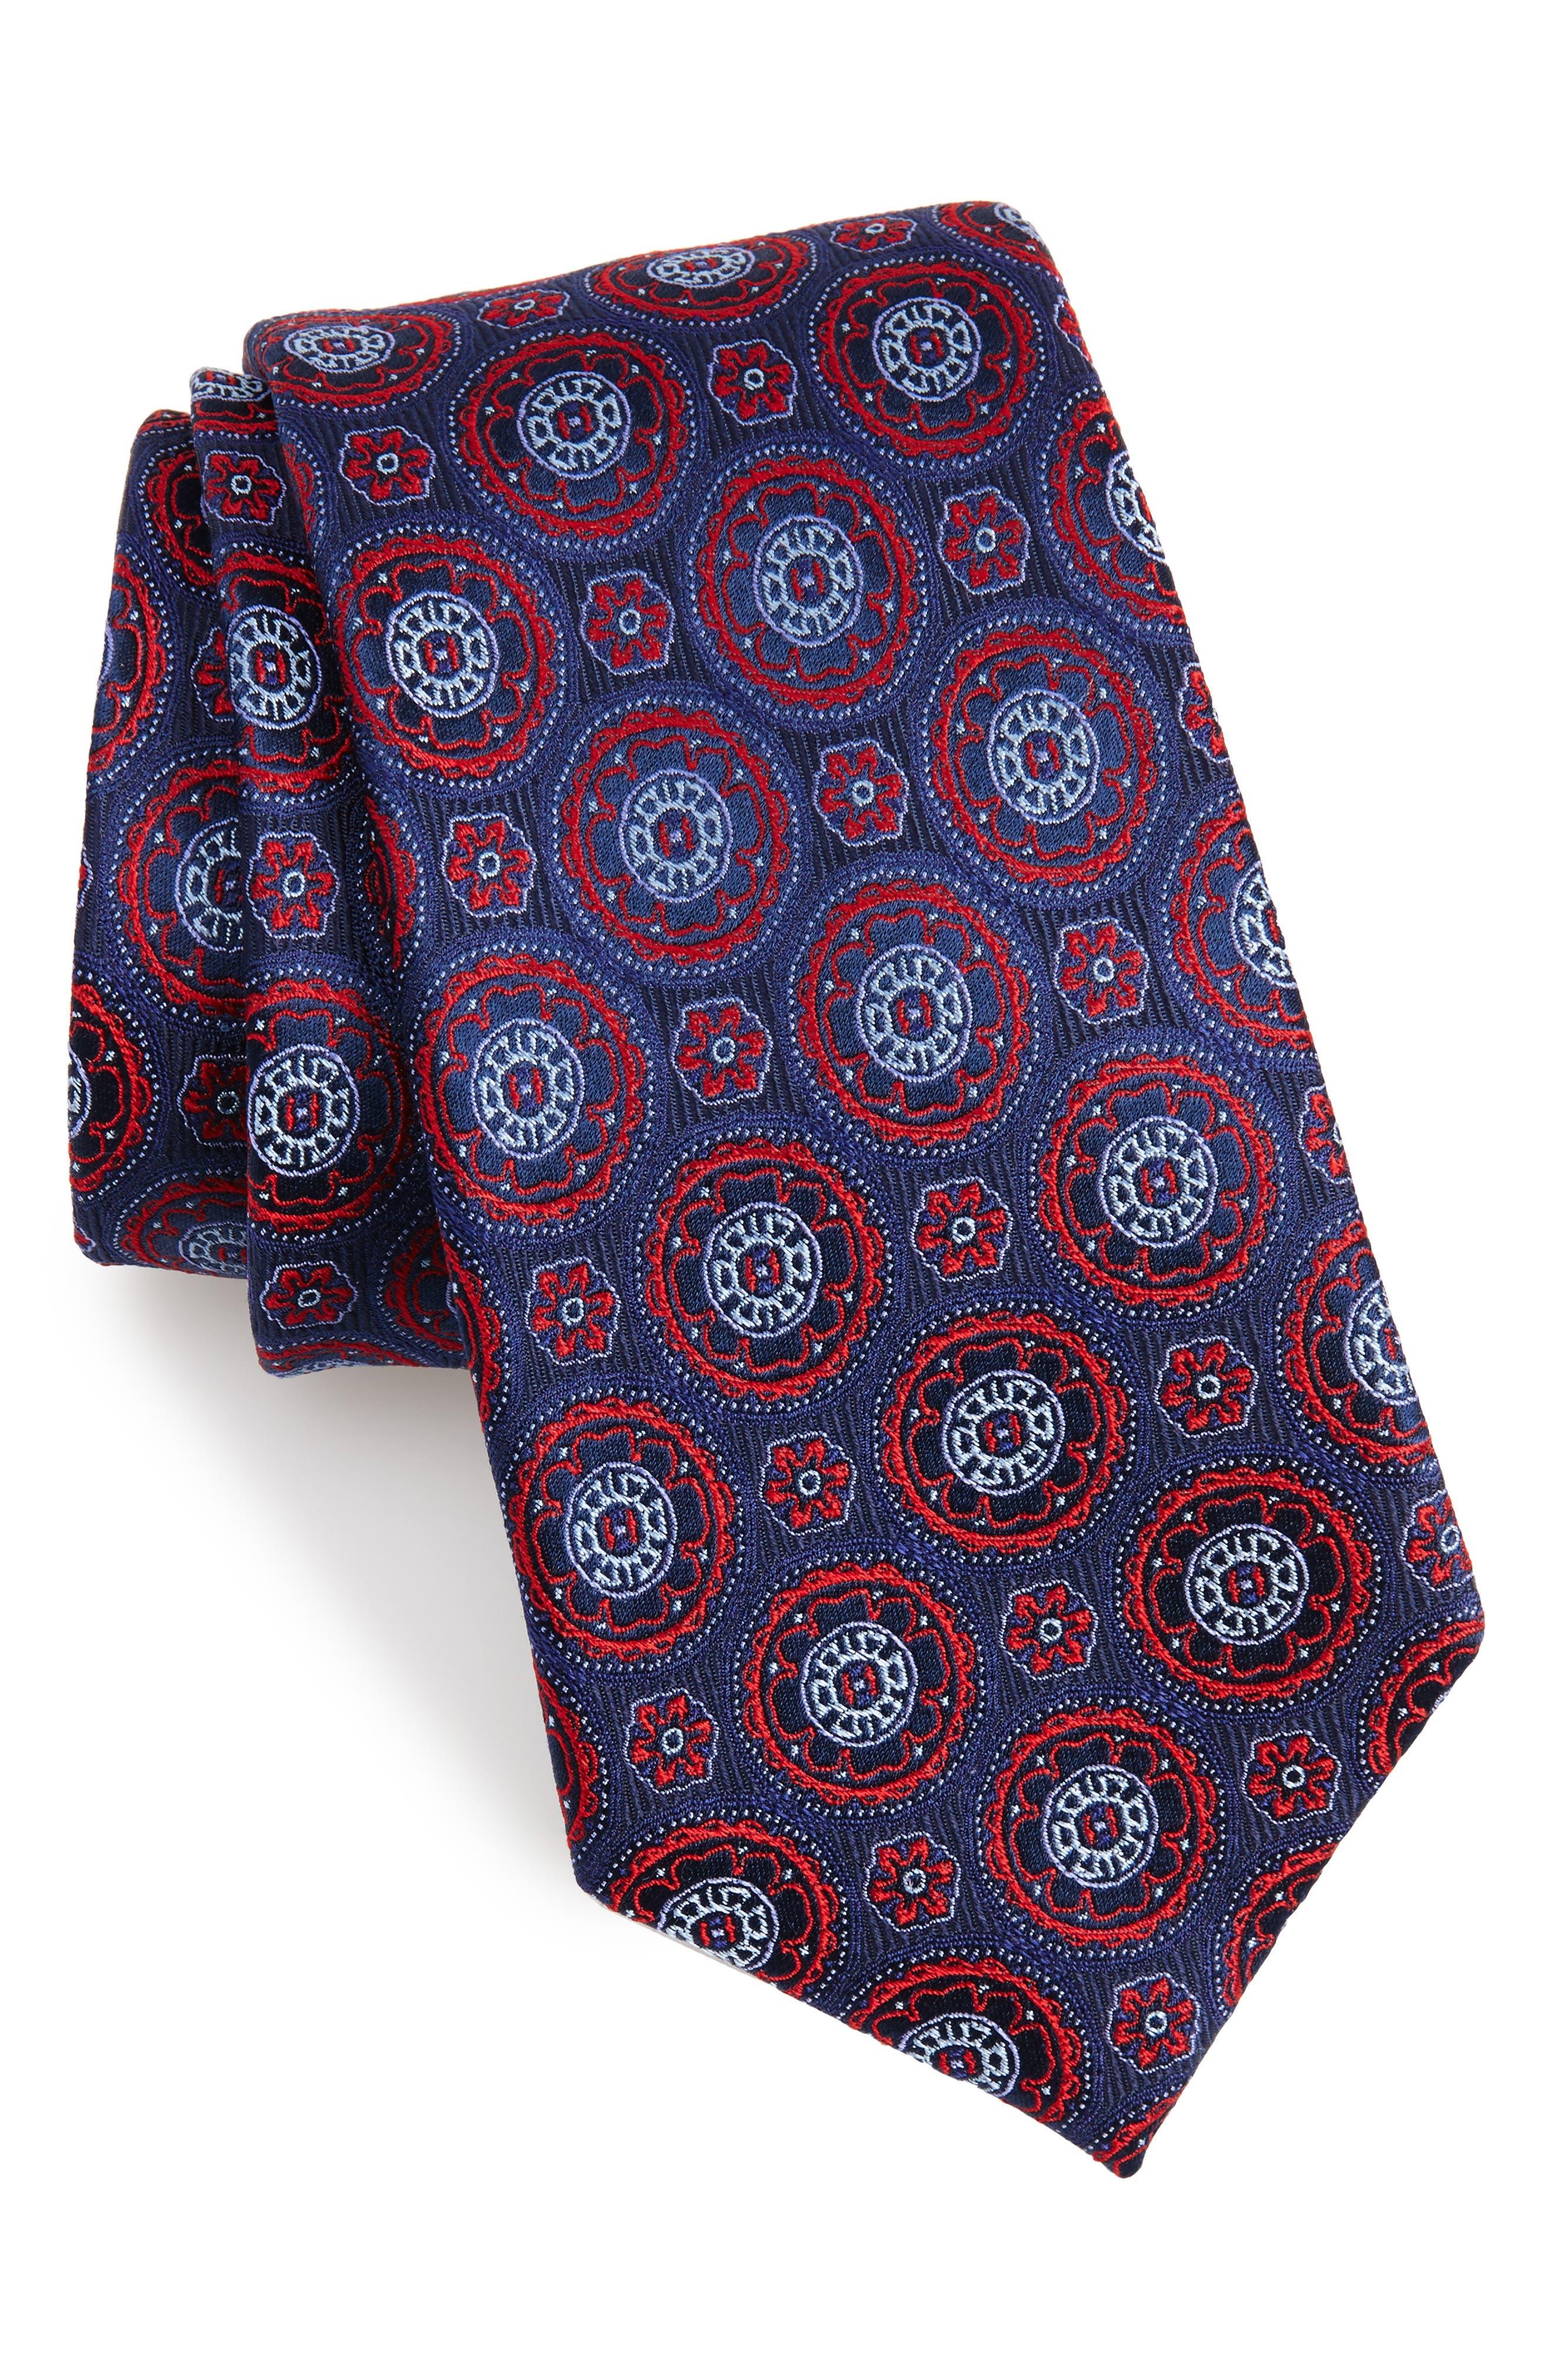 Nordstrom Men's Shop Kensington Medallion Silk Tie (X-Long)